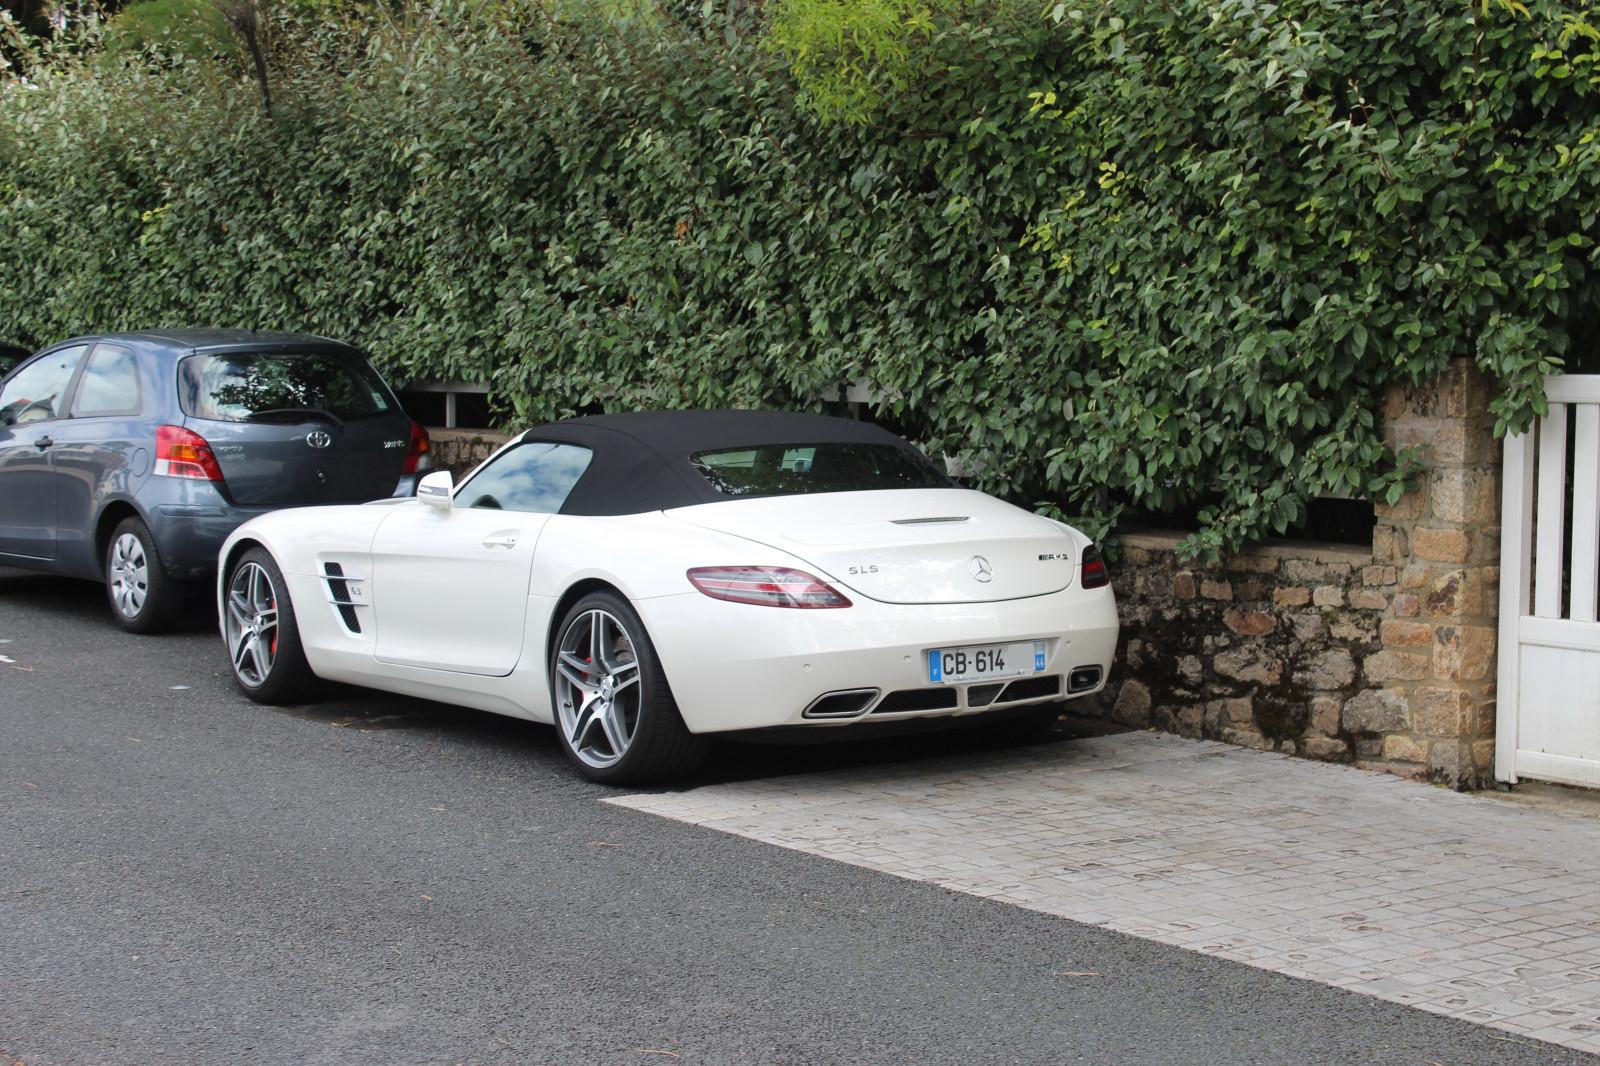 Wallpaper : white, street, road, supercars, Mercedes Benz ...